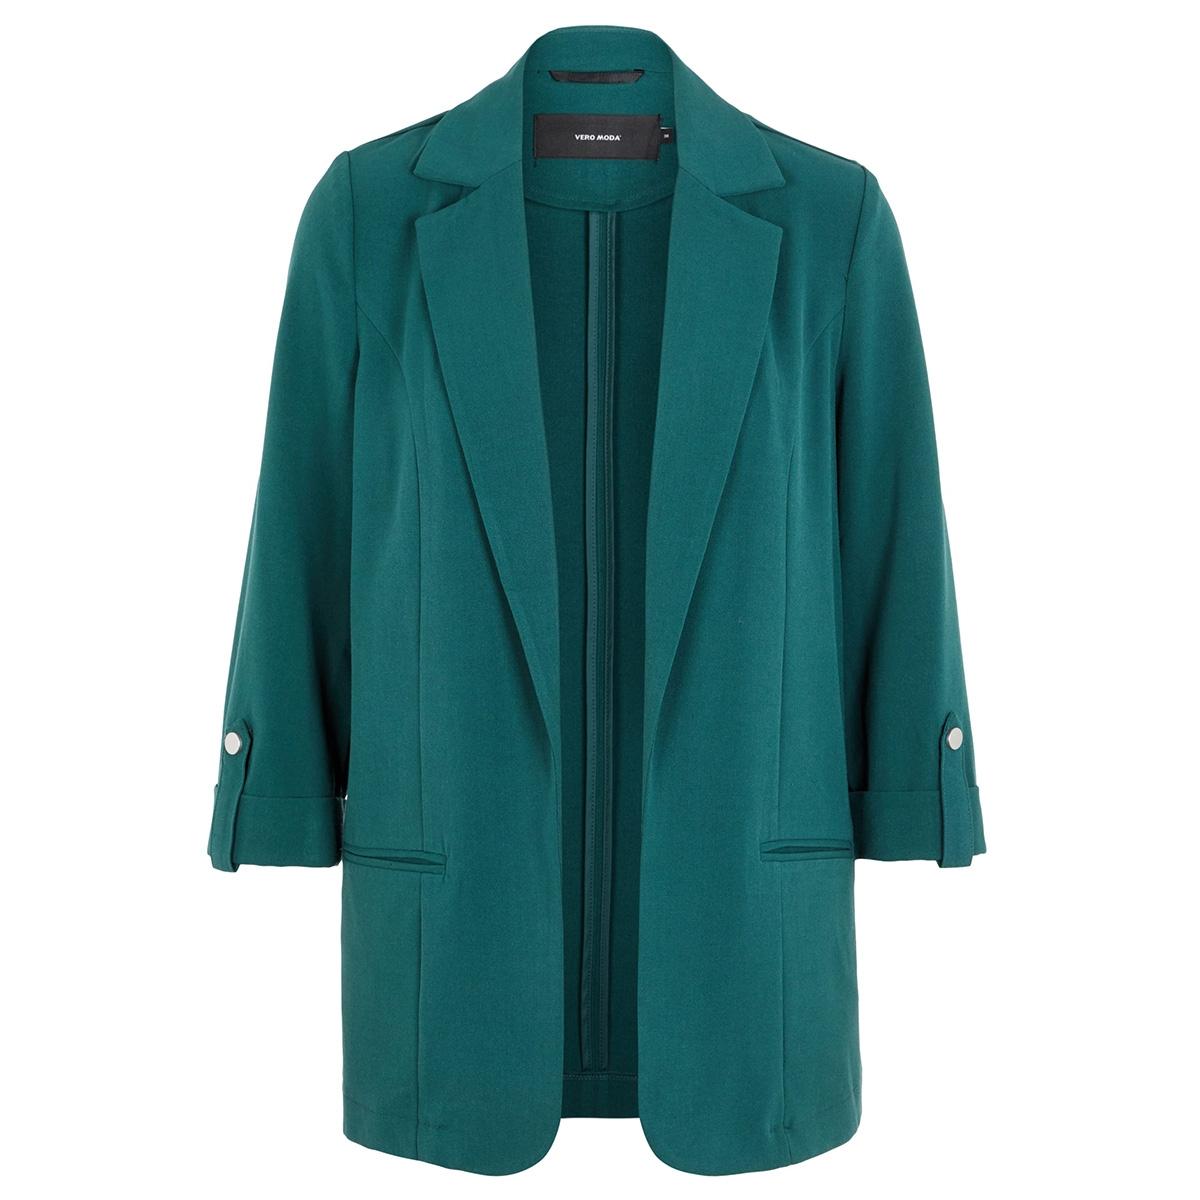 vmcissy 7/8 blazer 10219988 vero moda blazer ponderosa pine